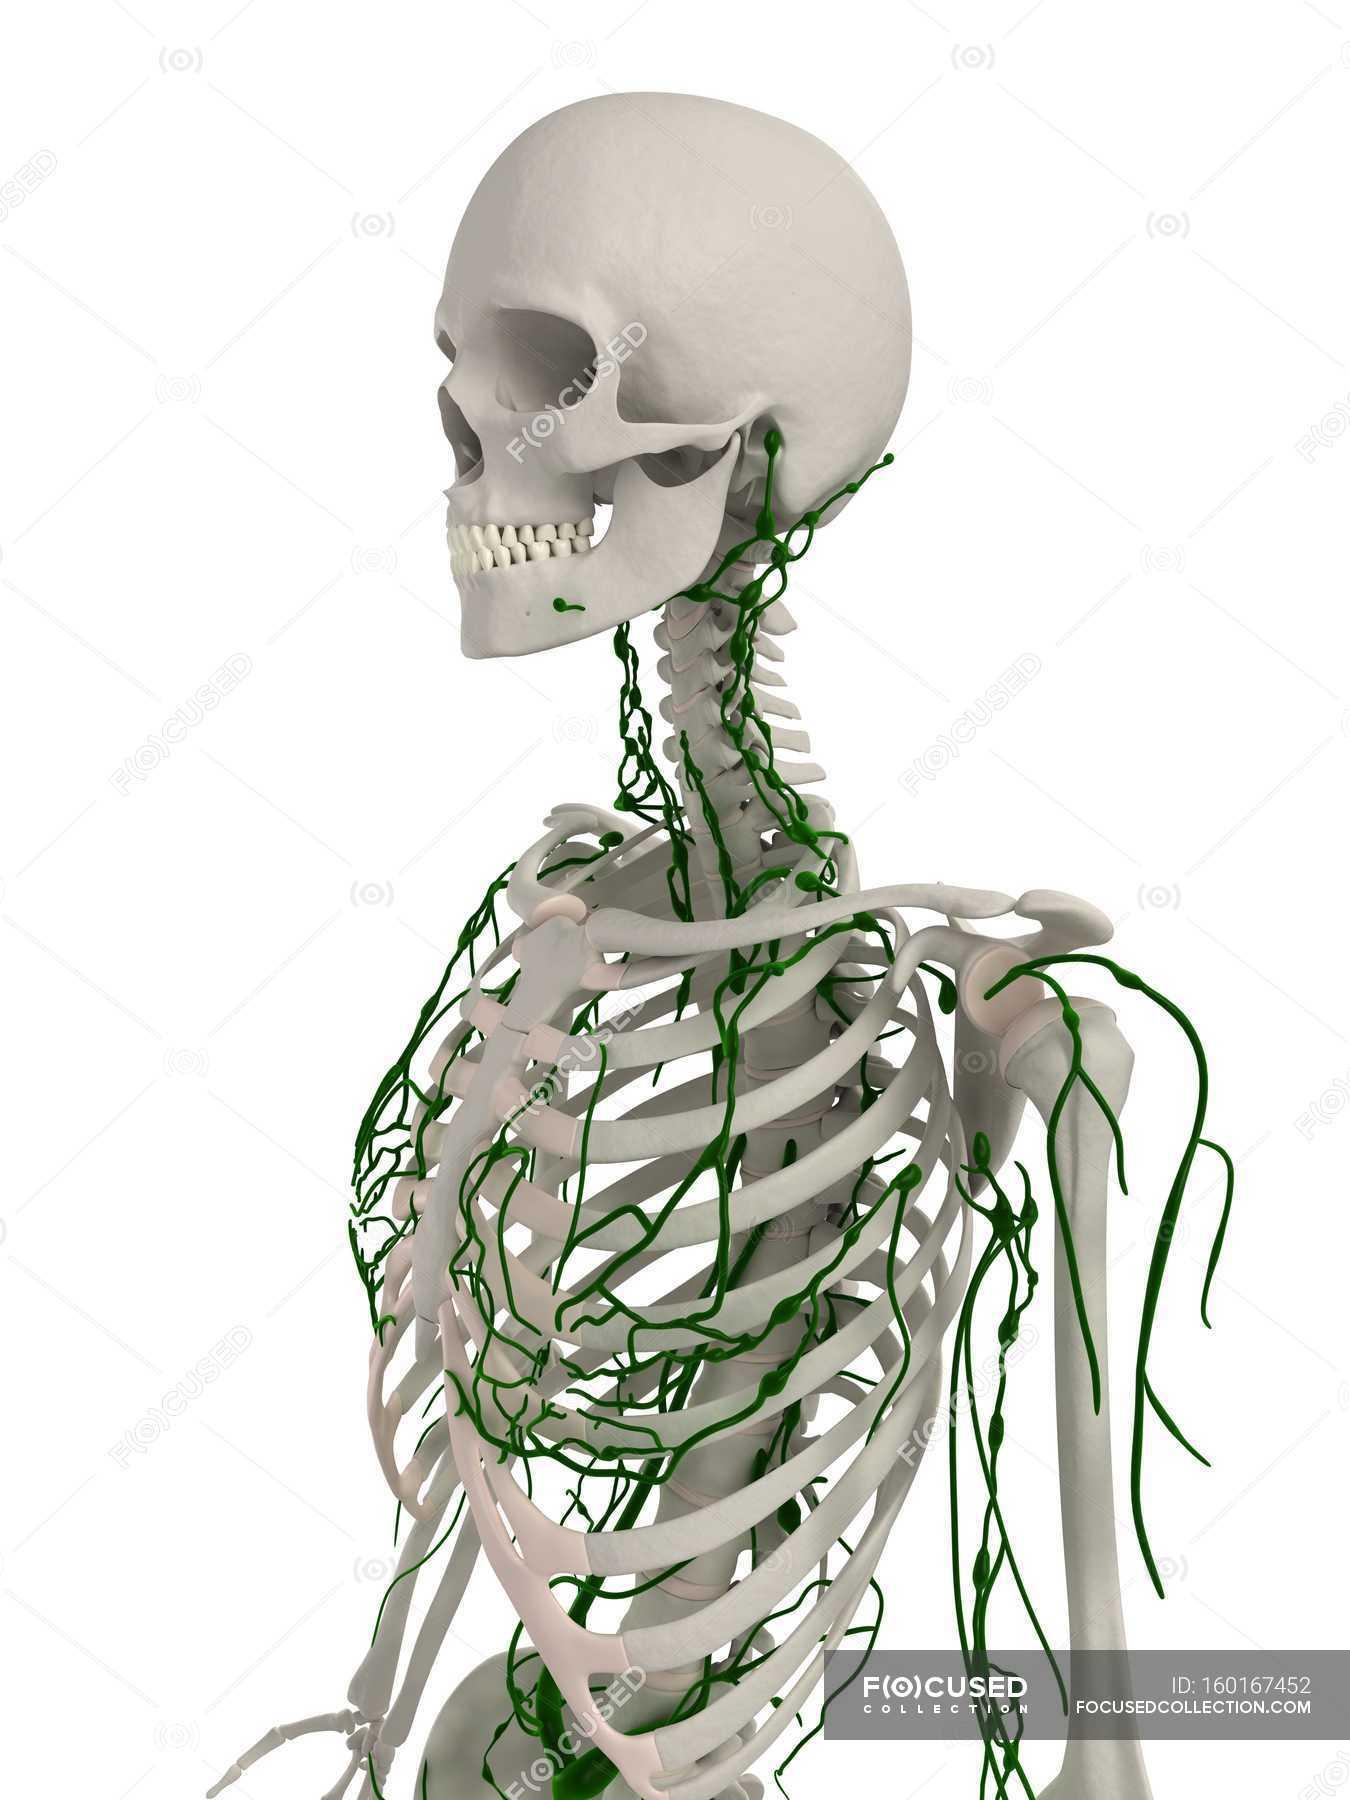 Großartig Skelett System Bilder Fotos - Anatomie Ideen - finotti.info